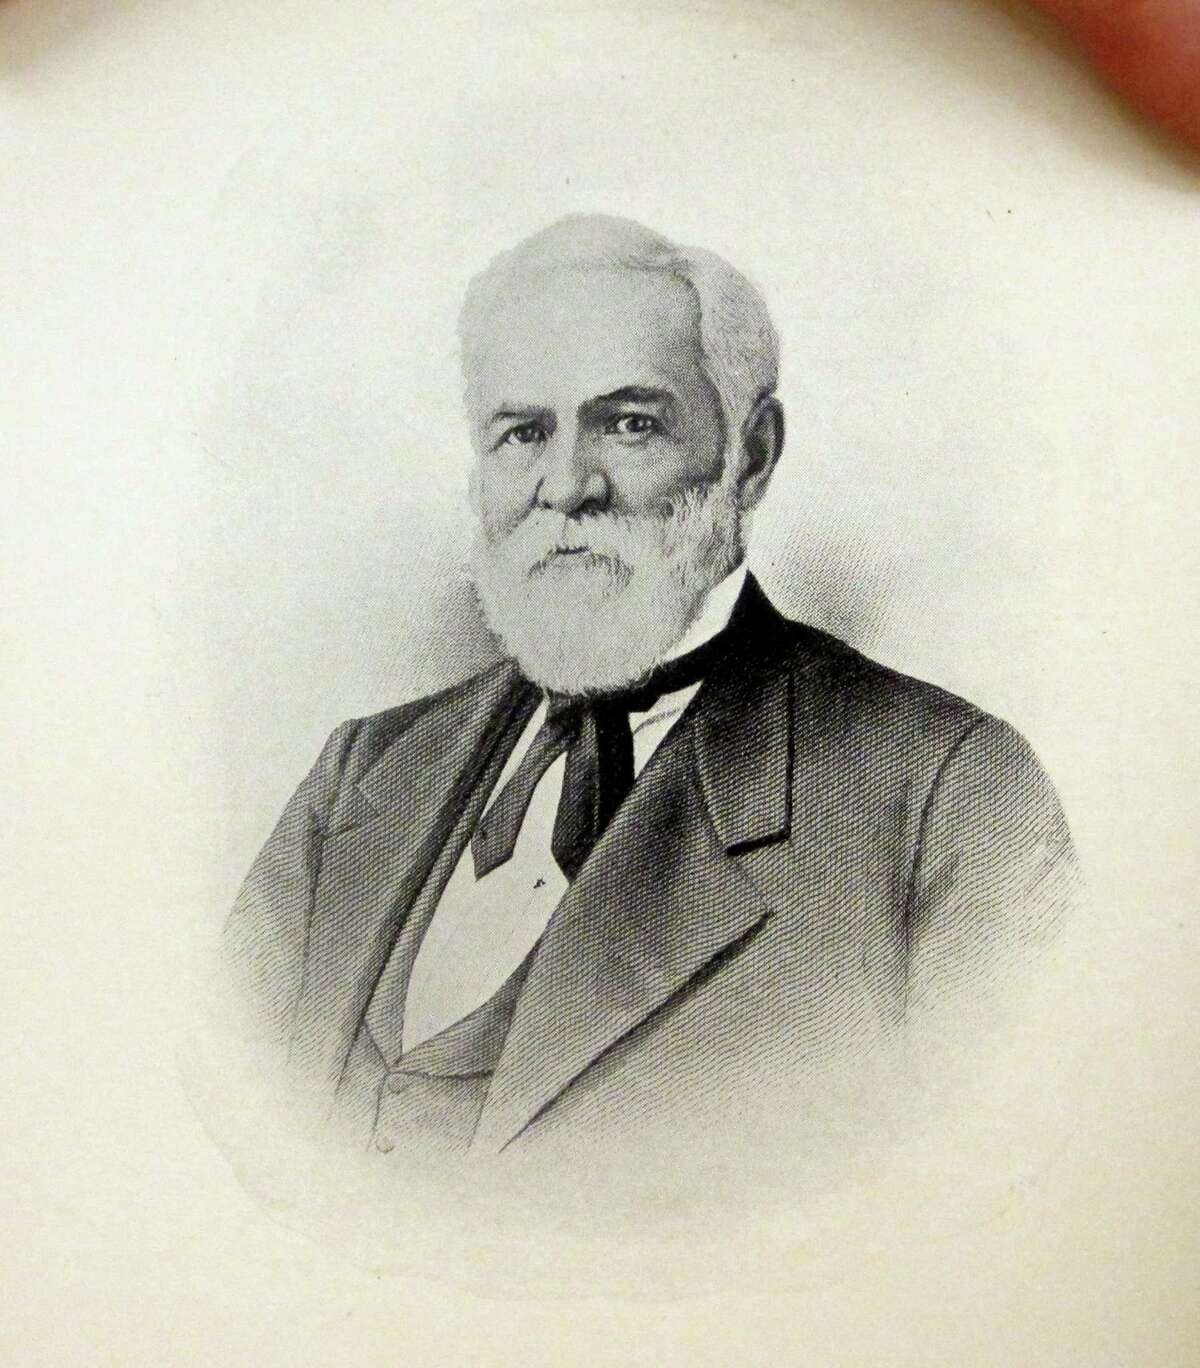 Josiah Root, Landmarks of Albany County, New York, Edited by Amasa J. Parker, D. MASON & CO., PUBLISHERS, 1897.